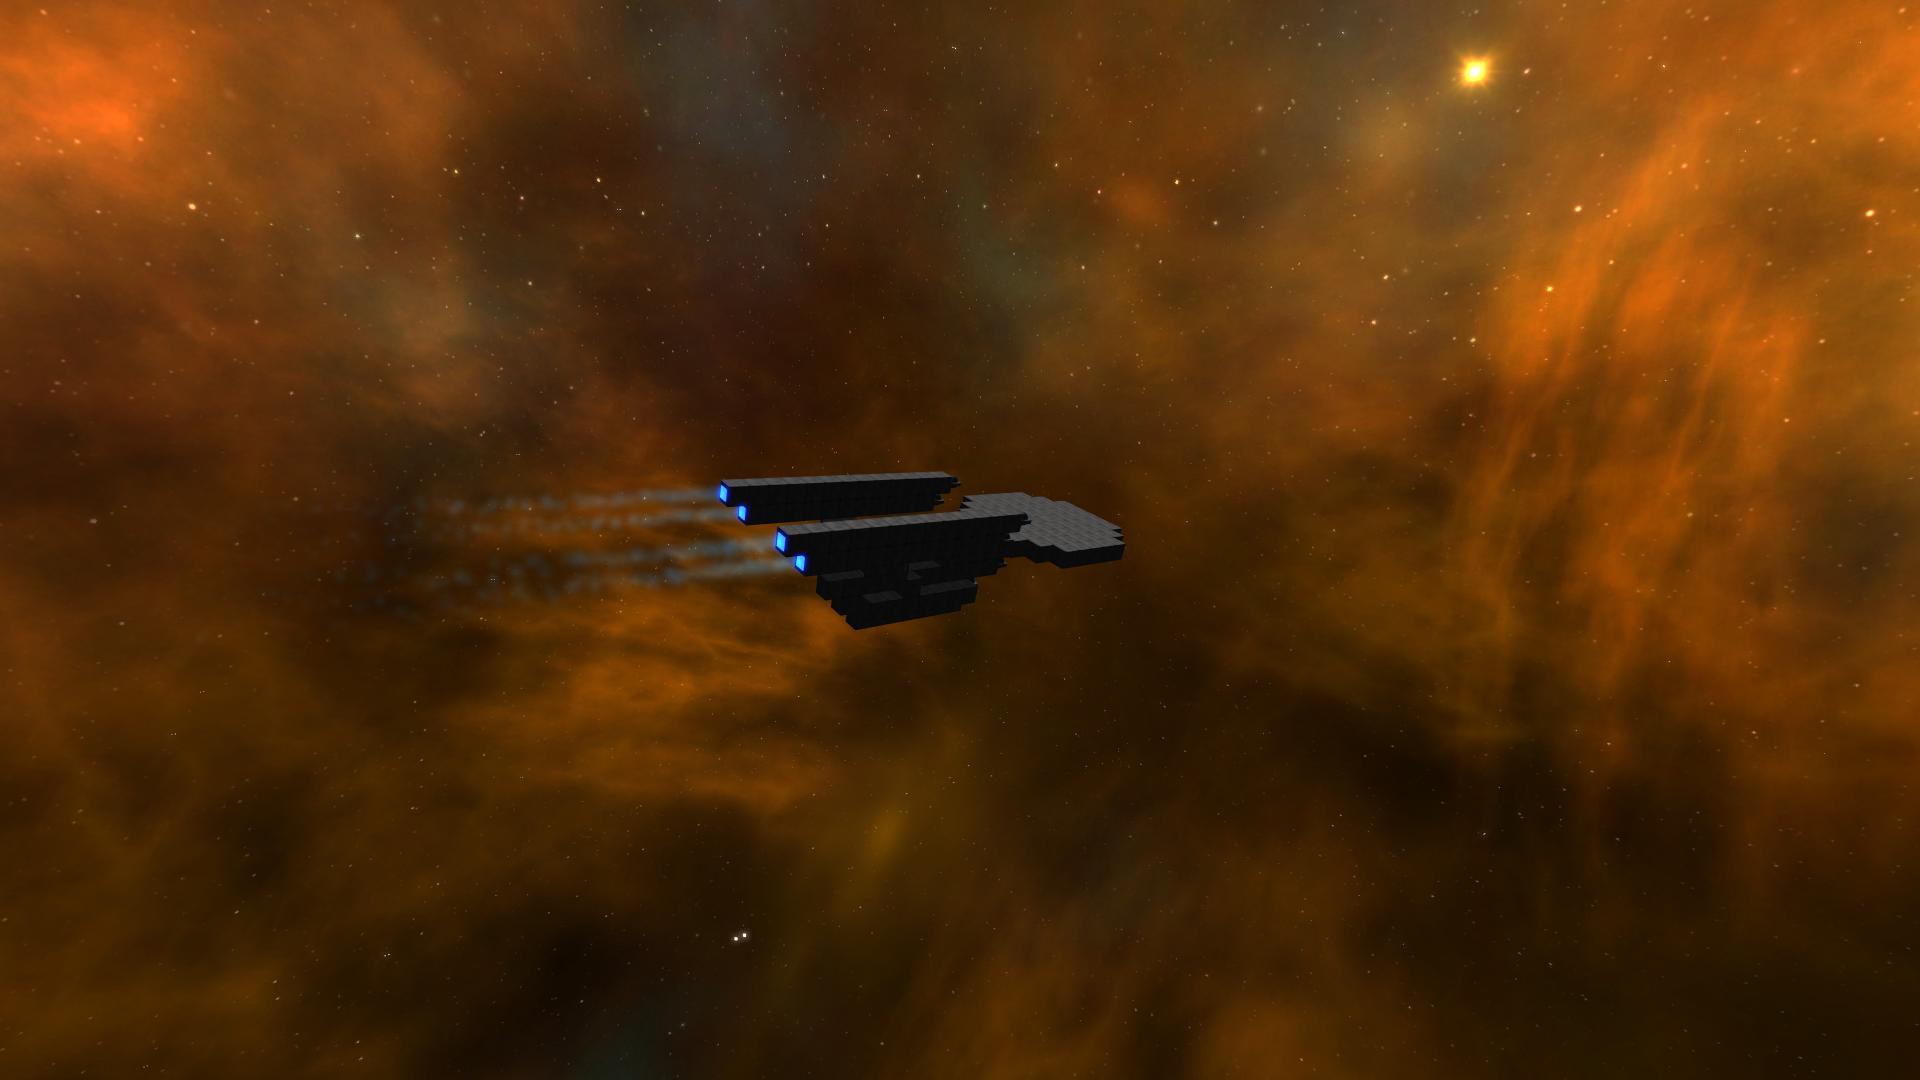 Enterprise refit in an orange nebula